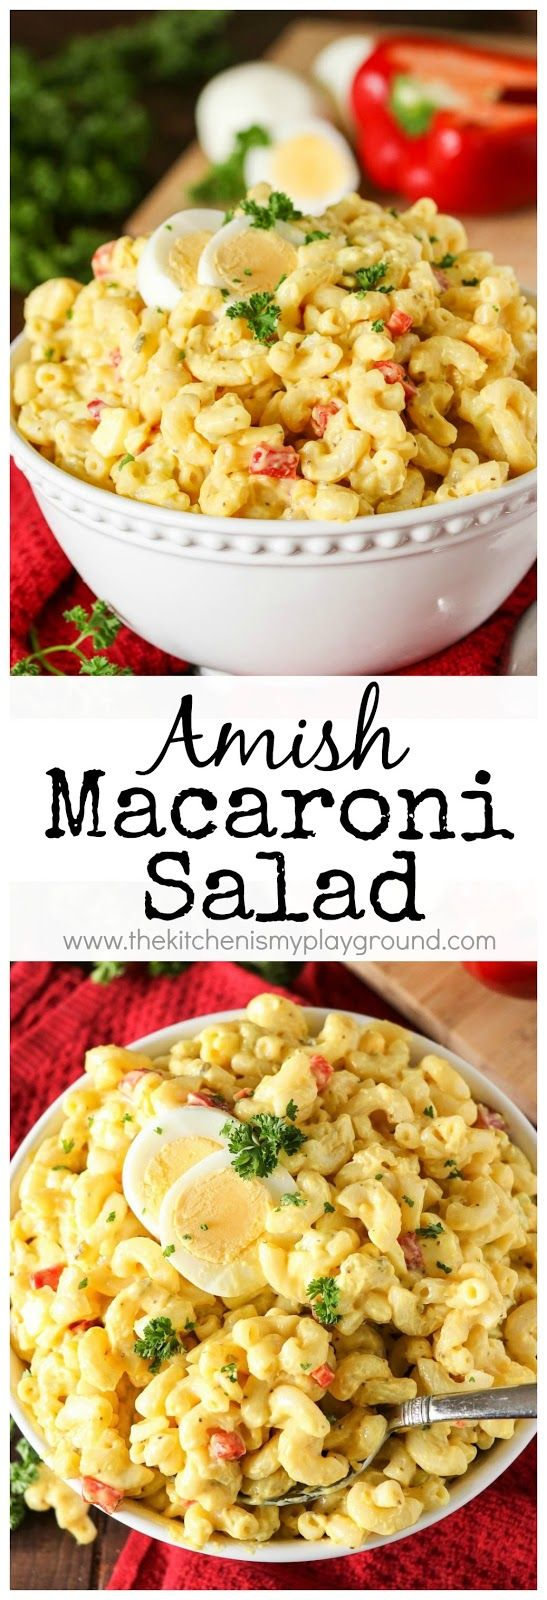 Amish Macaroni Salad -   22 macaroni salad recipes ideas